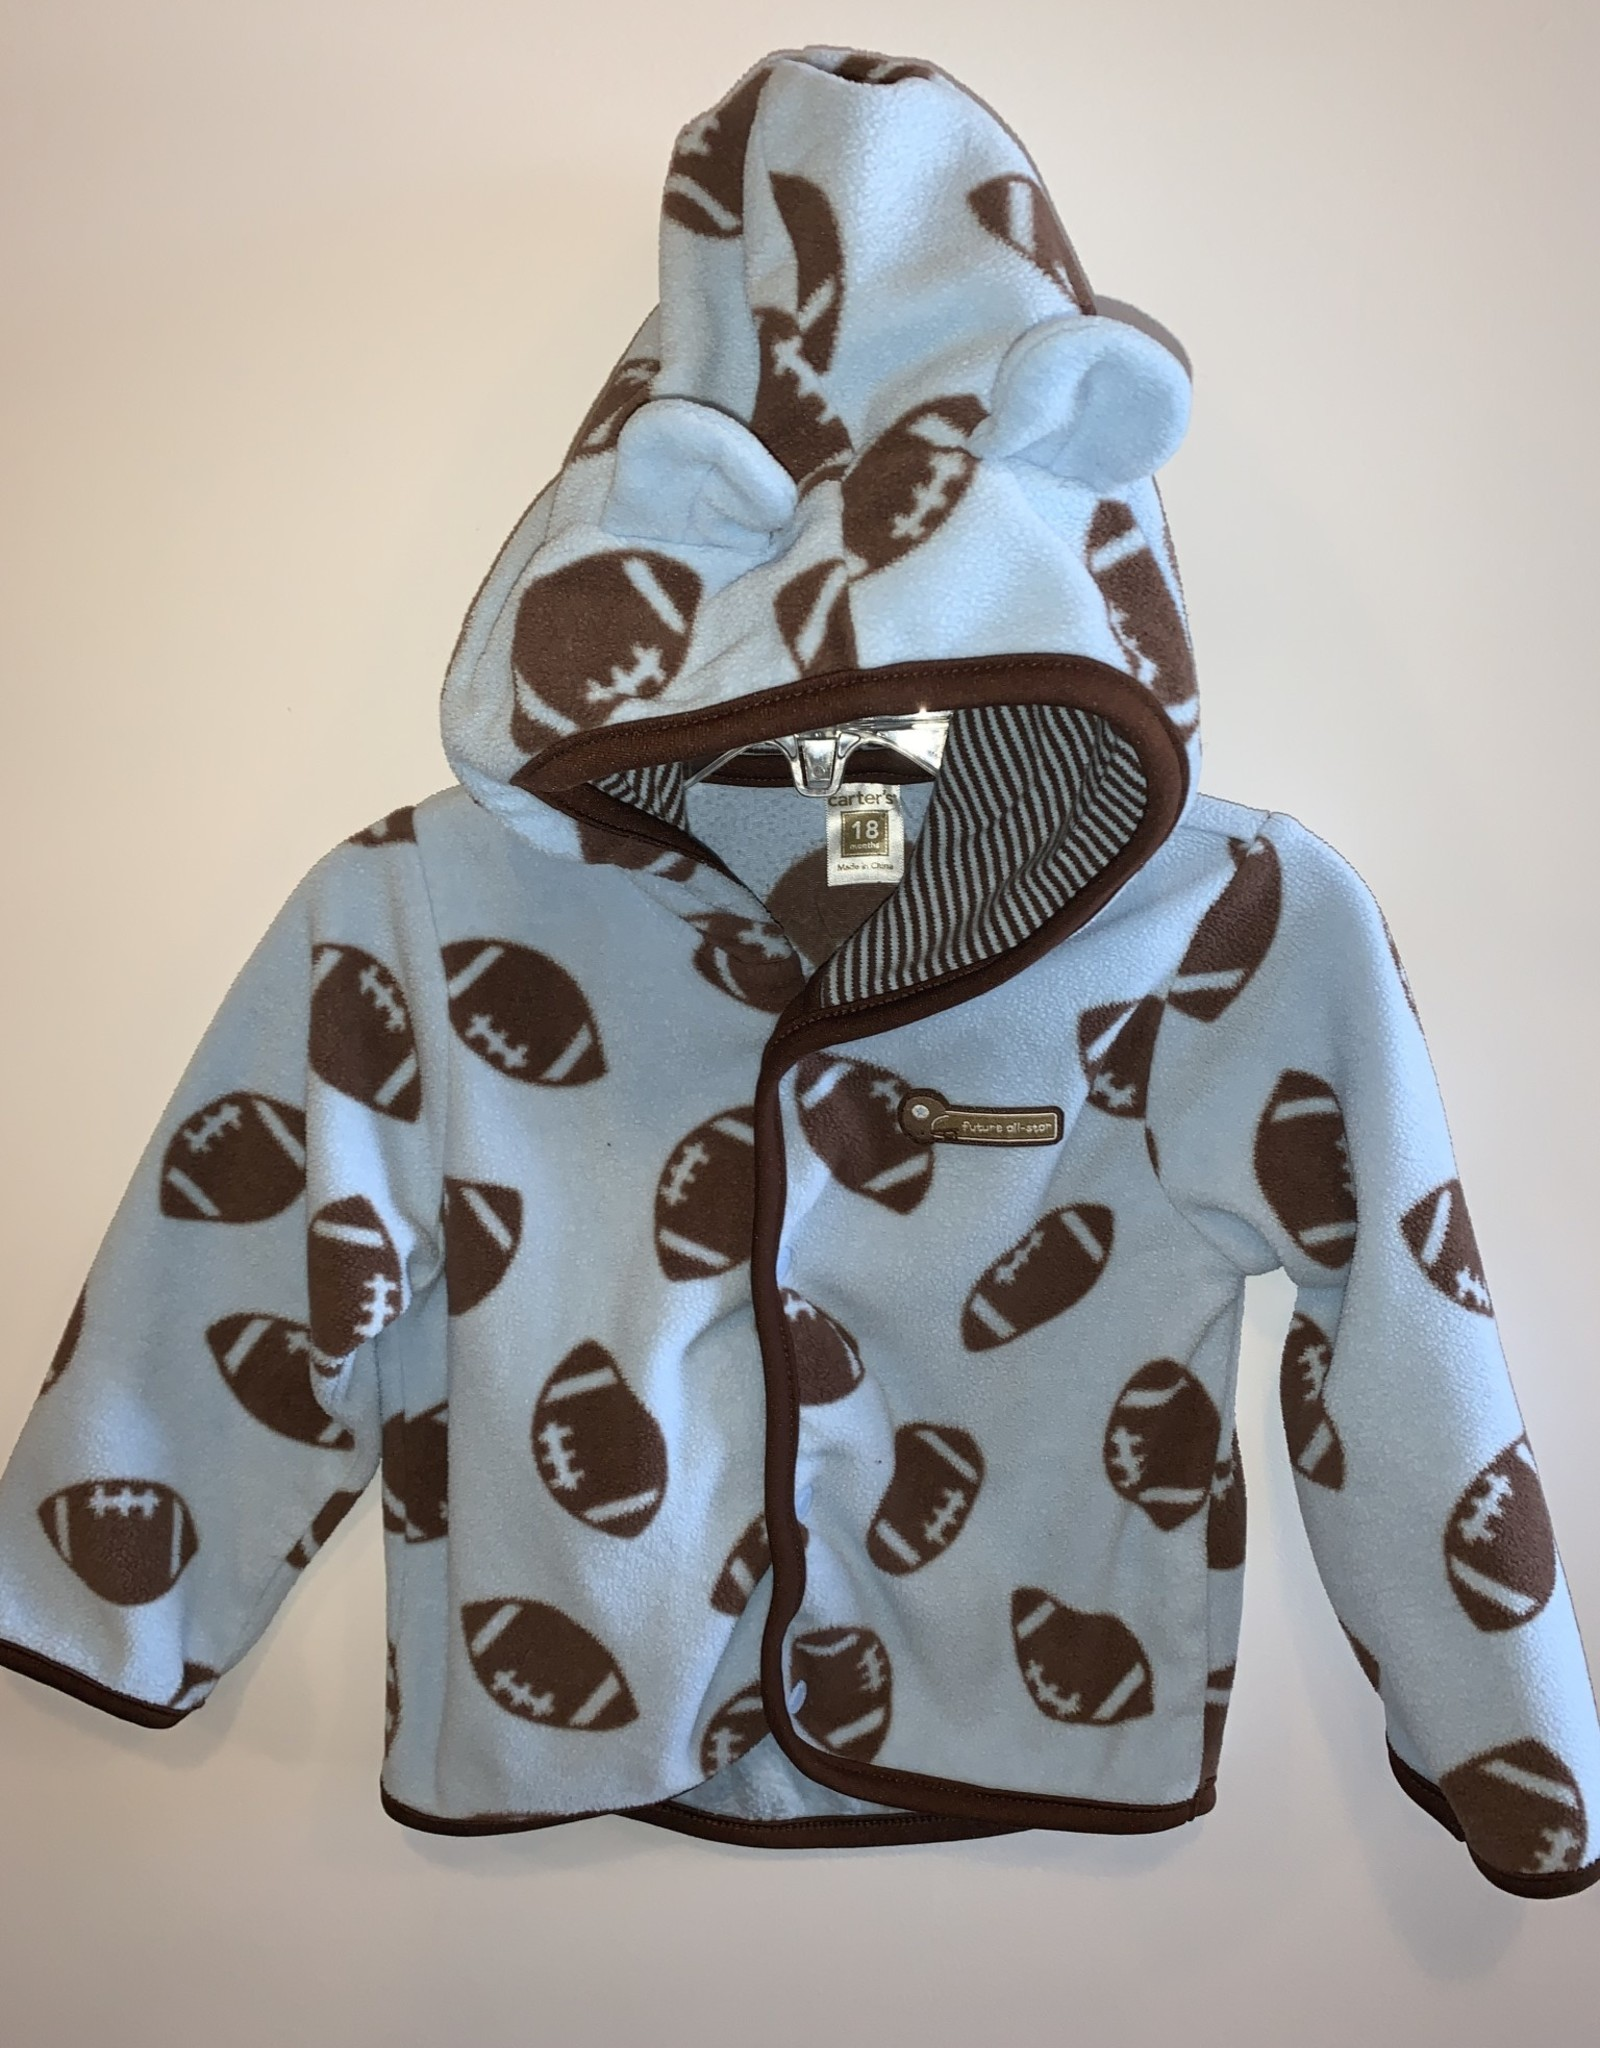 Carter's Boys/12-18/Carters/Sweater